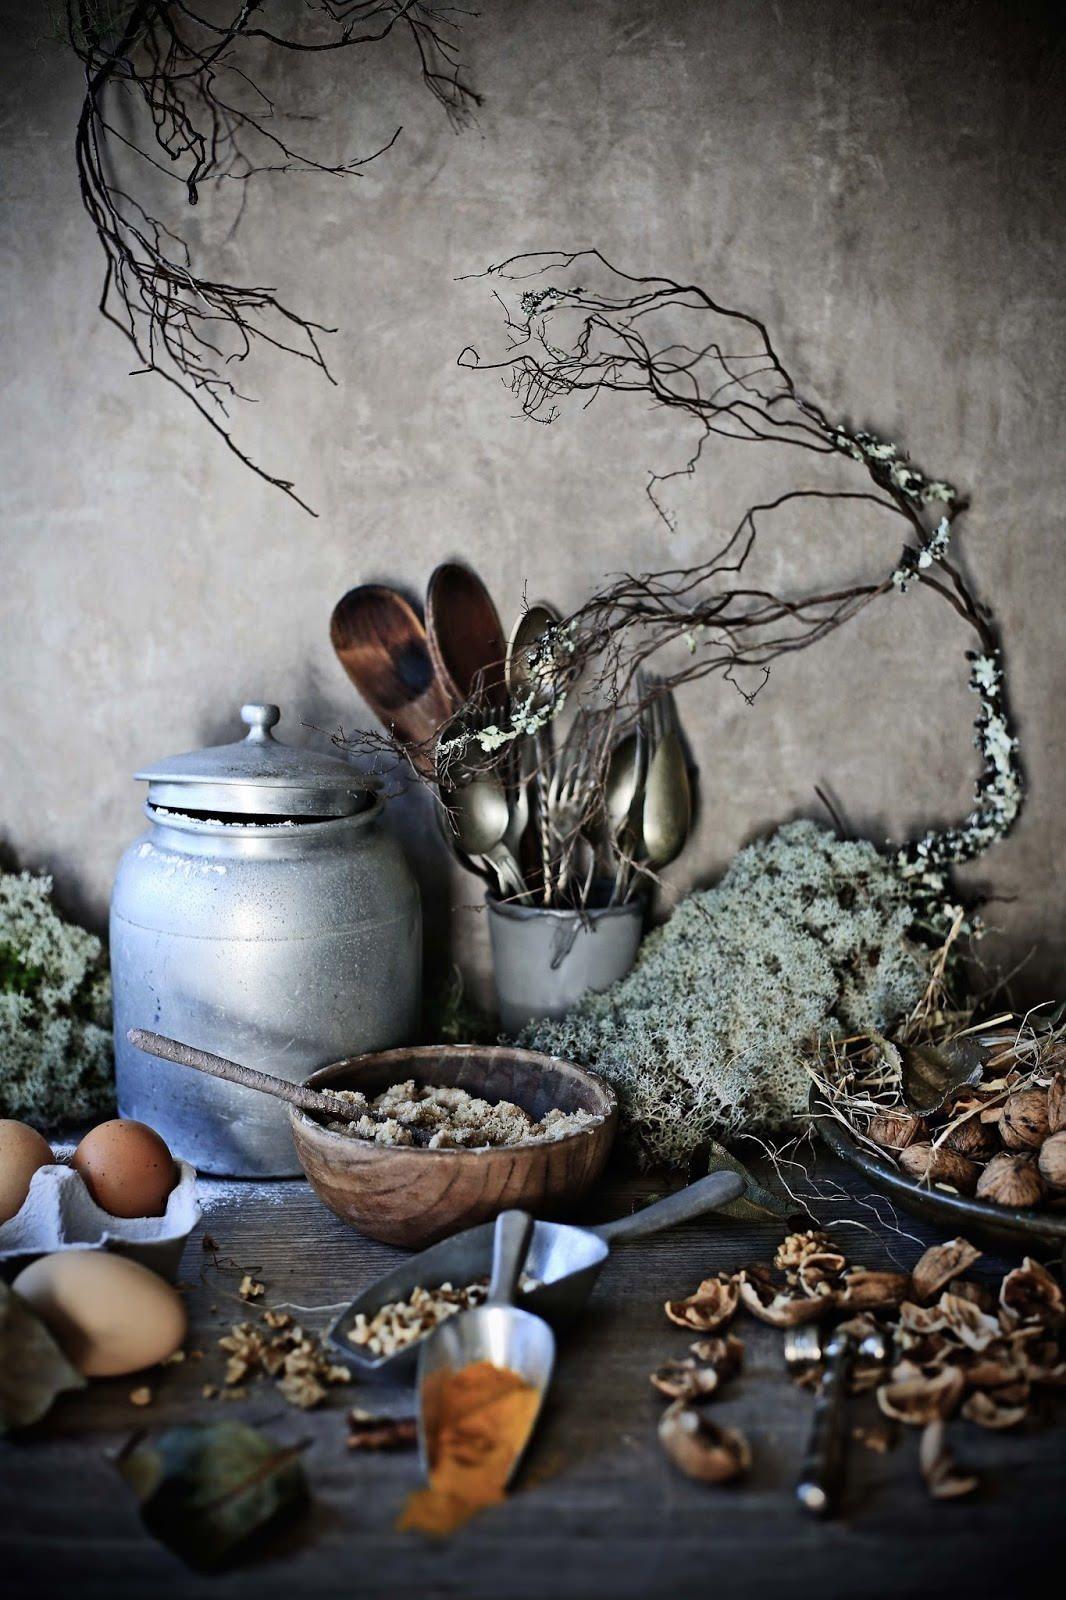 Ingredients in 2020 dark food photography food